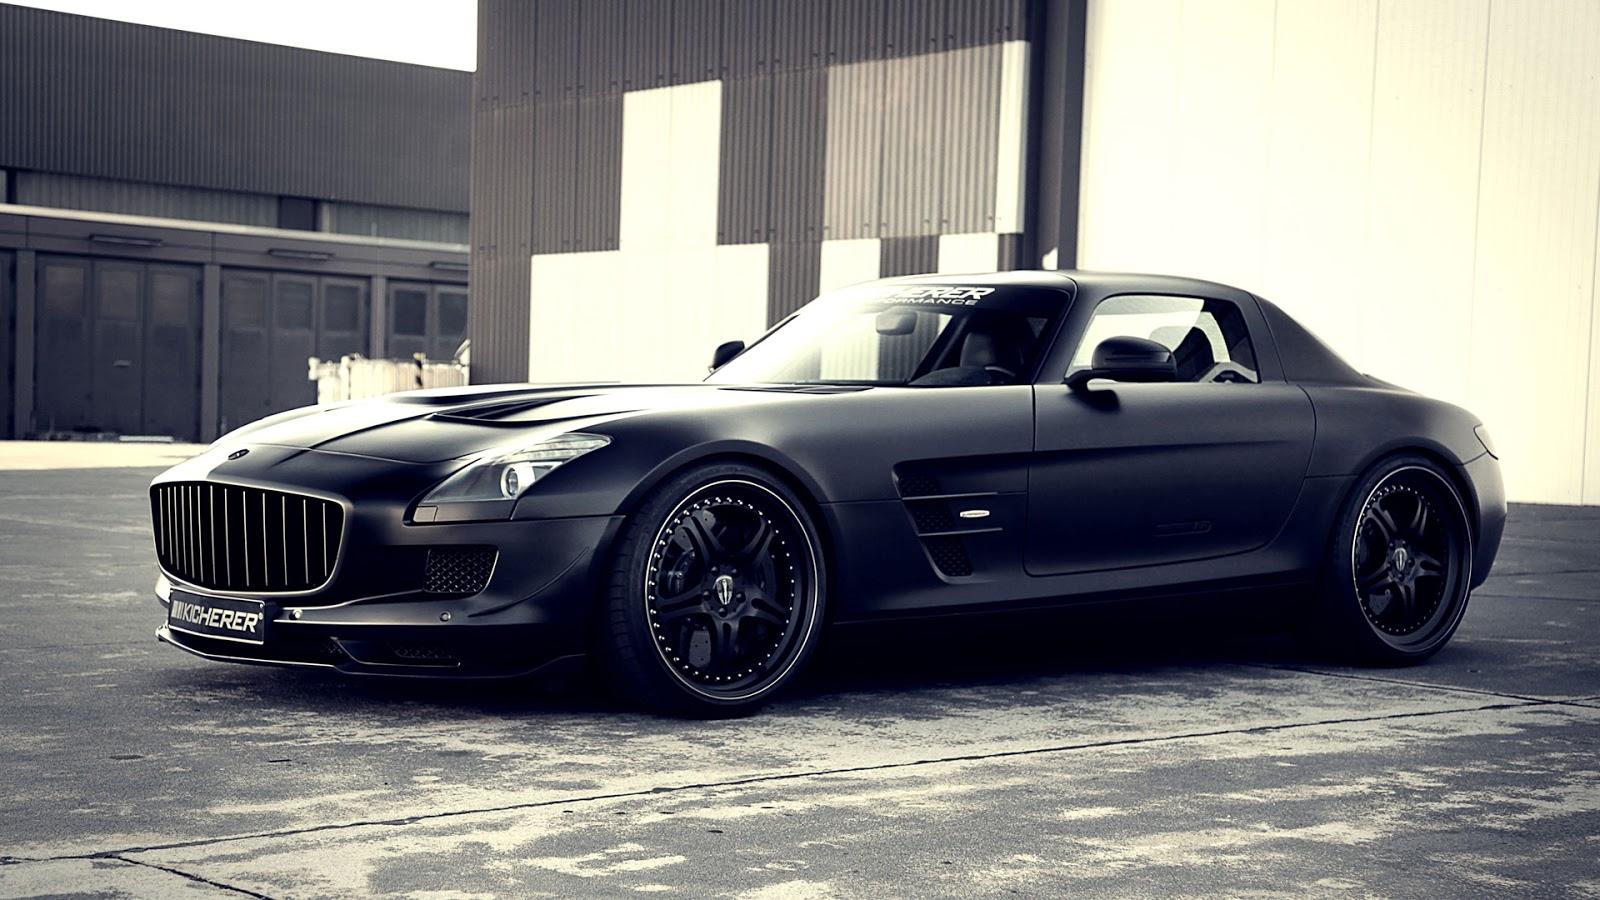 Mercedes Benz Sls 63 Amg Supersport Gt Full Hd Wallpapers